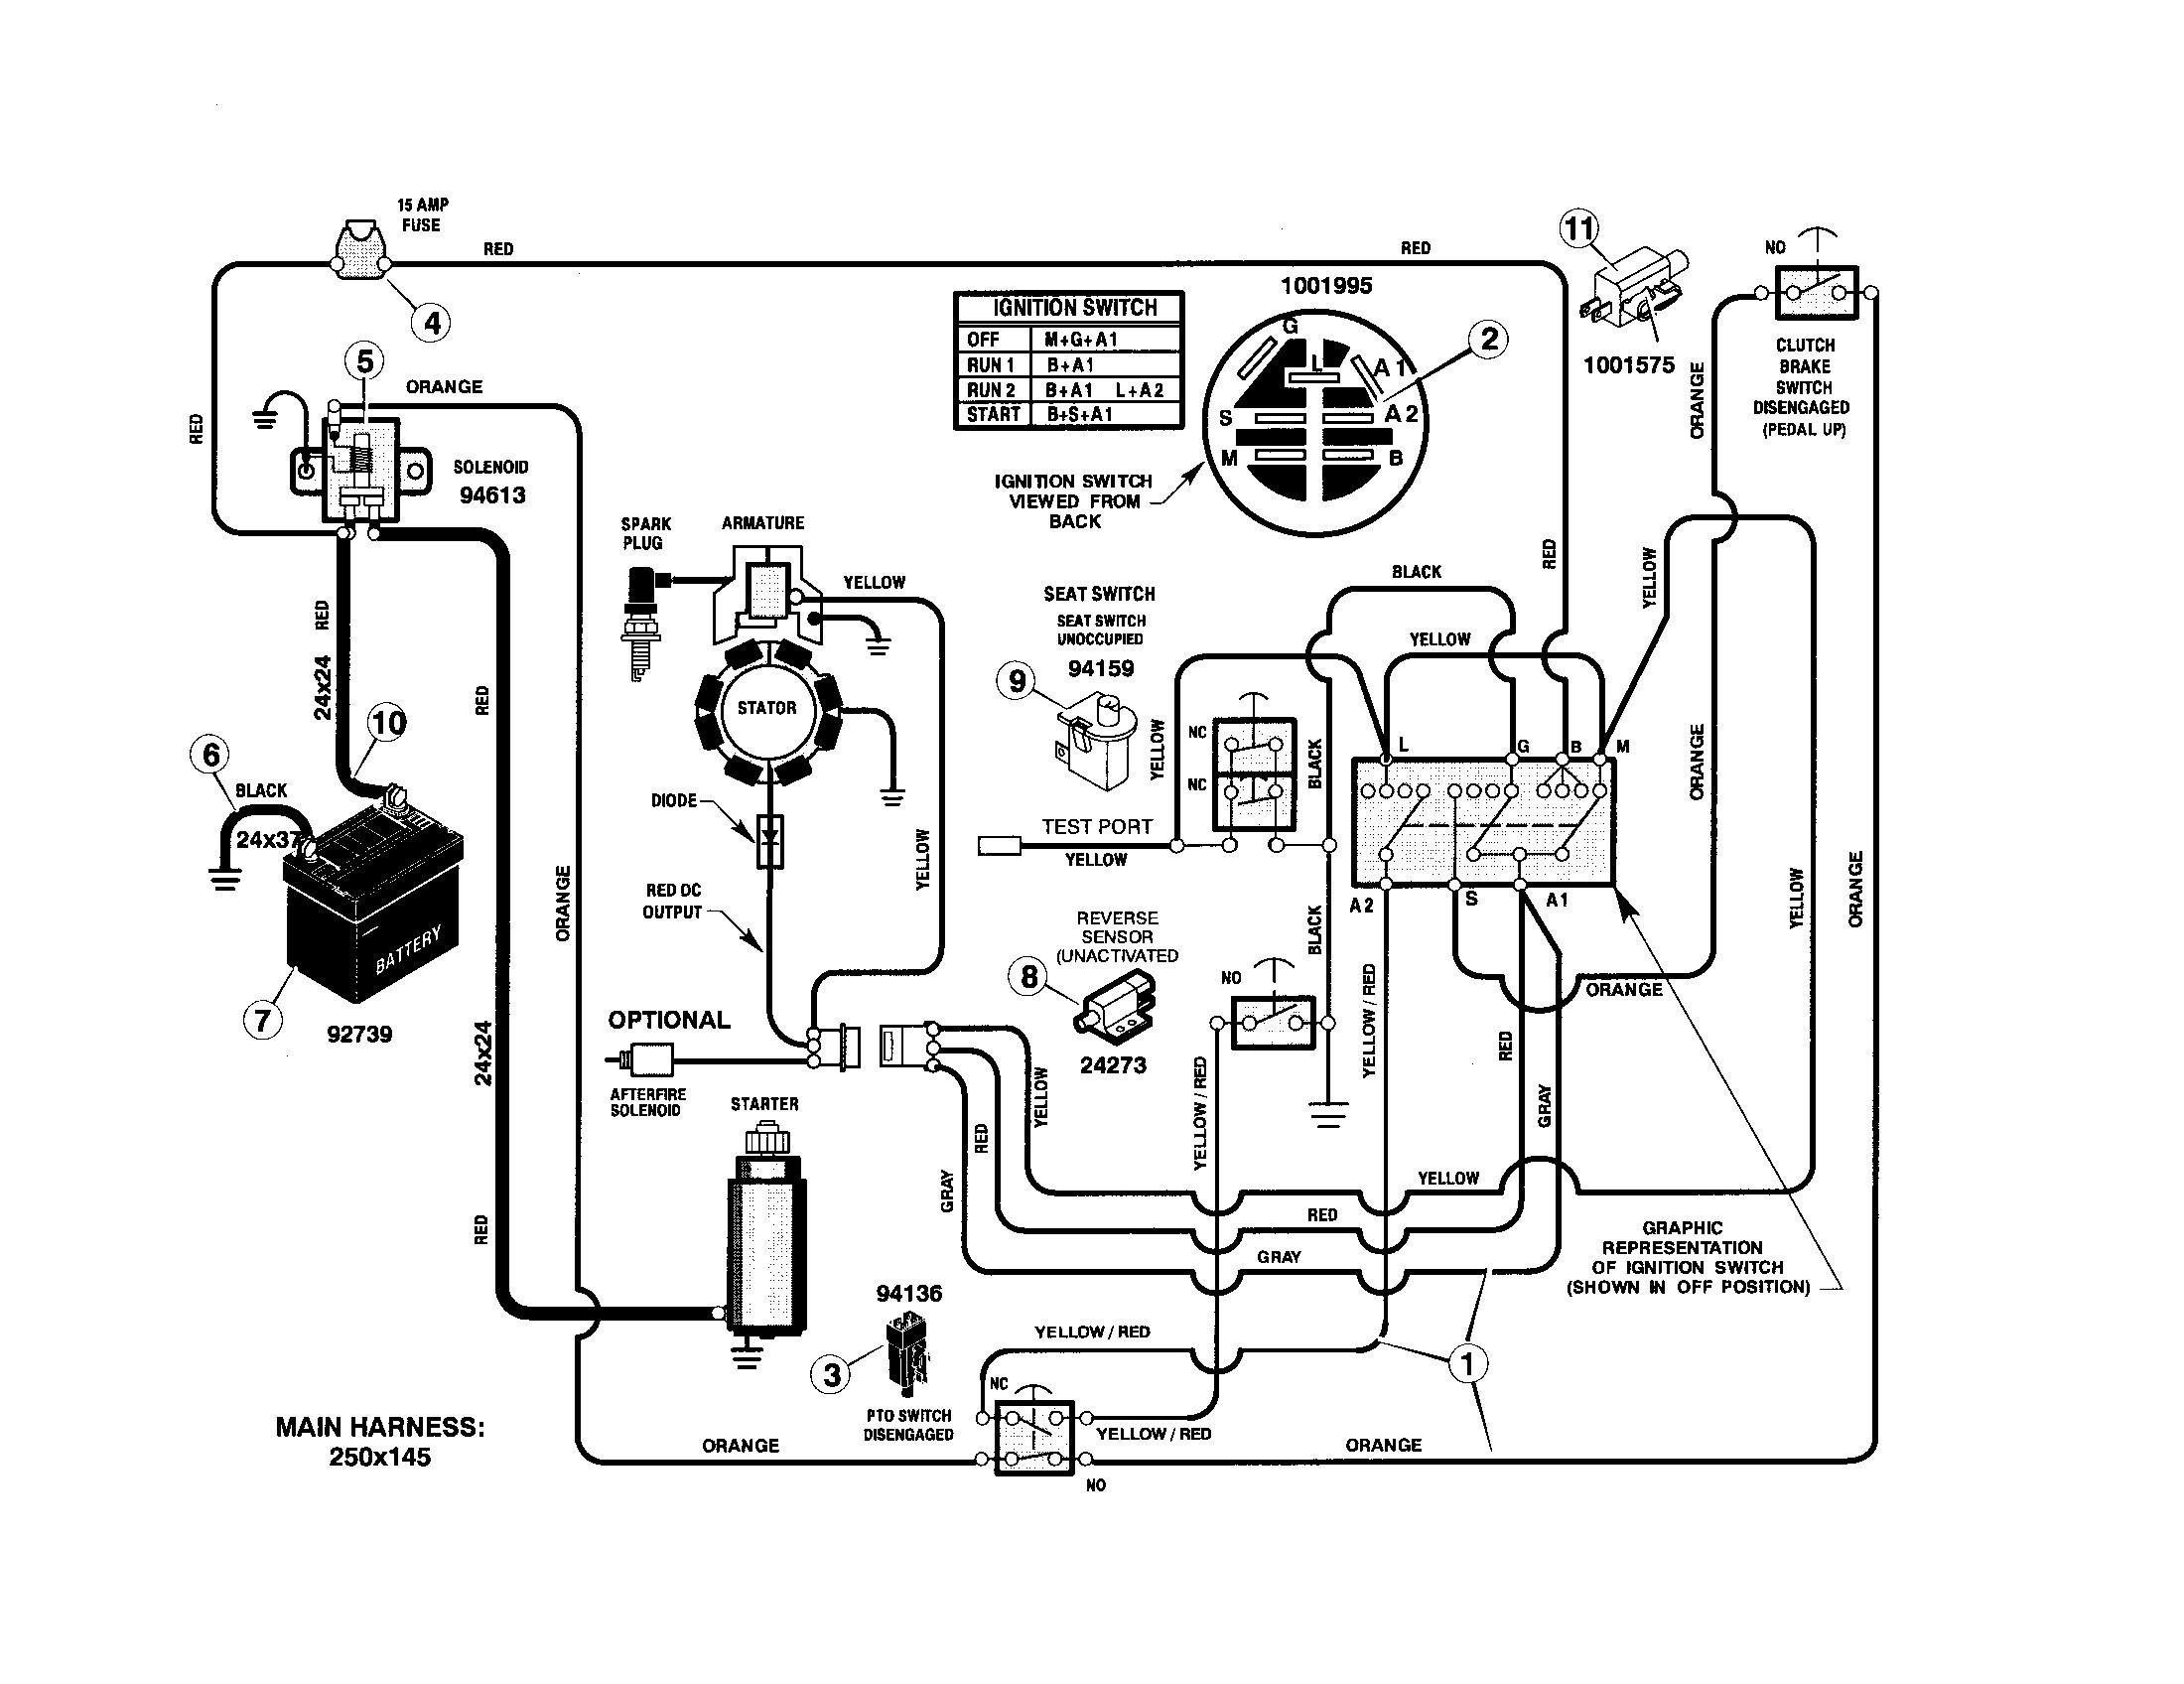 Wiring Diagram For Murray Riding Lawn Mower New Wiring Diagram For - Wiring Diagram For Murray Riding Lawn Mower